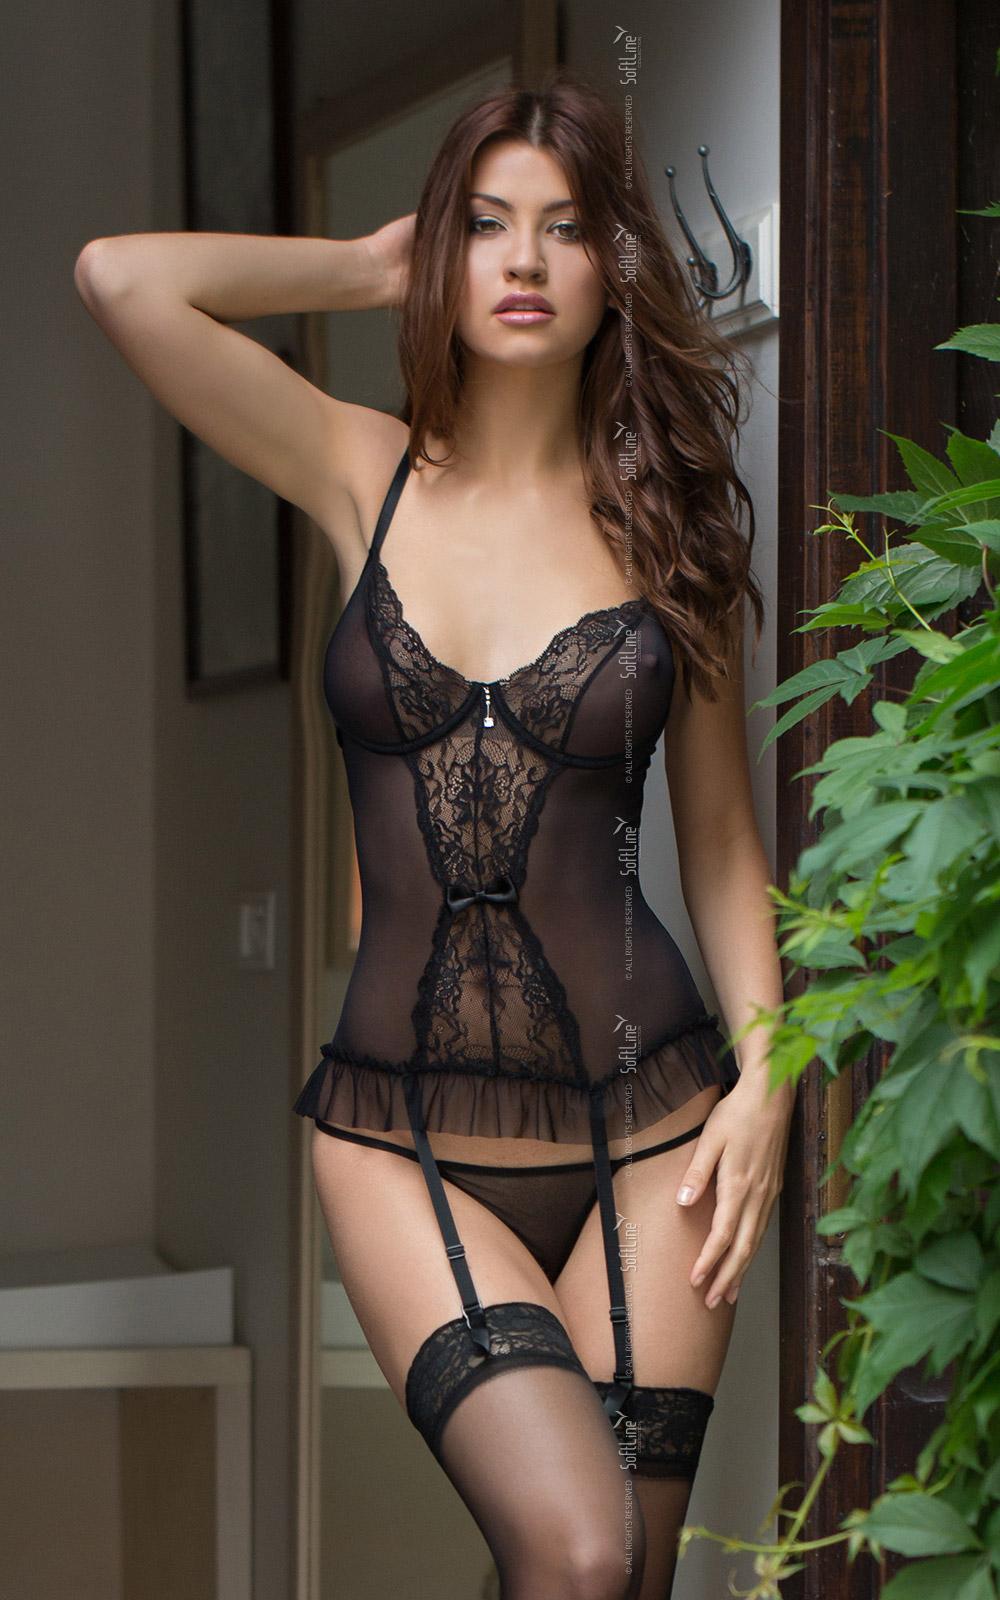 Glamour lingerie gallery — img 5